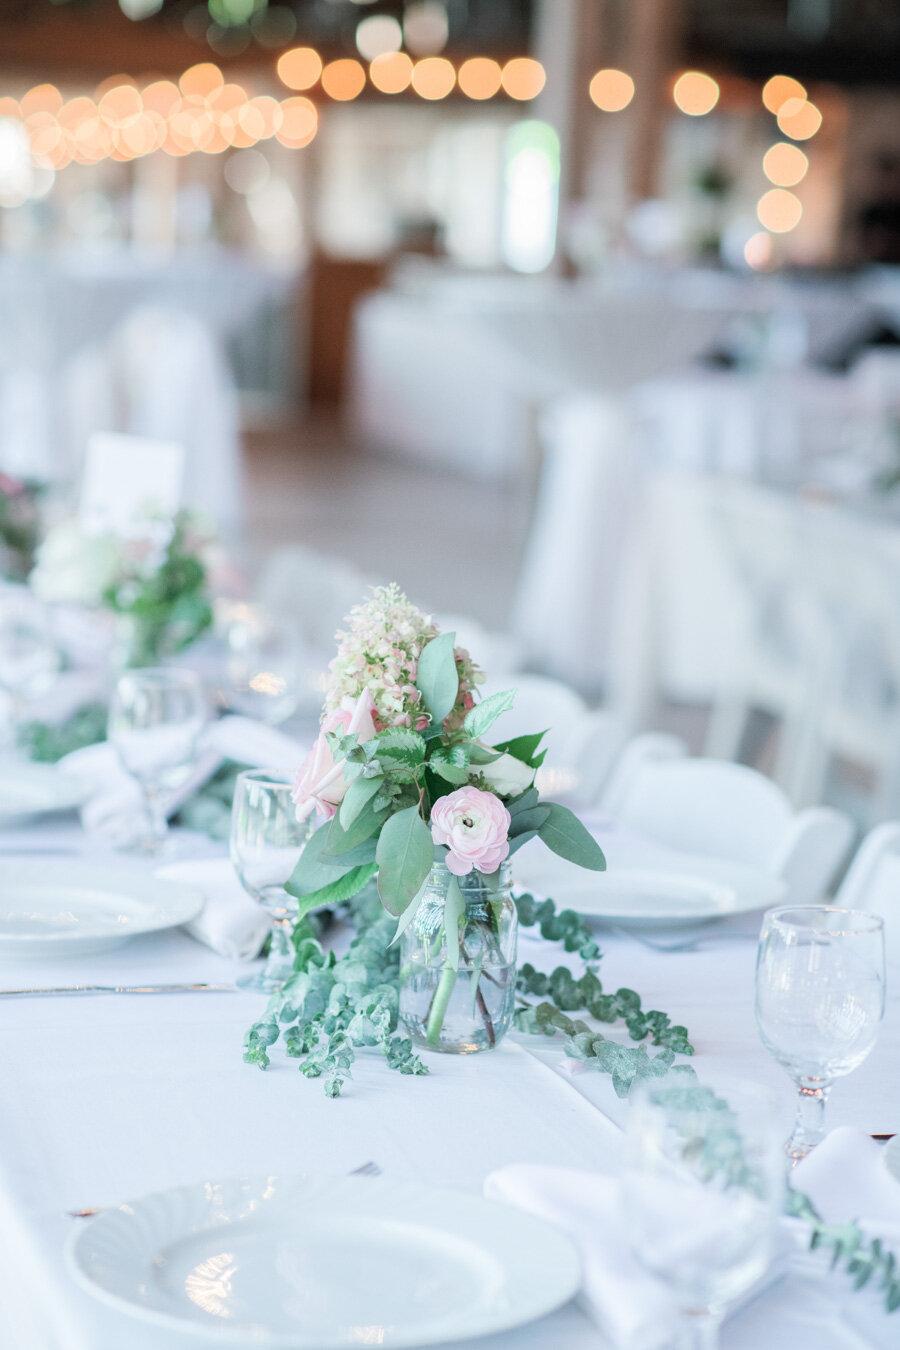 about-thyme-farm-door-county-wedding-040.jpg